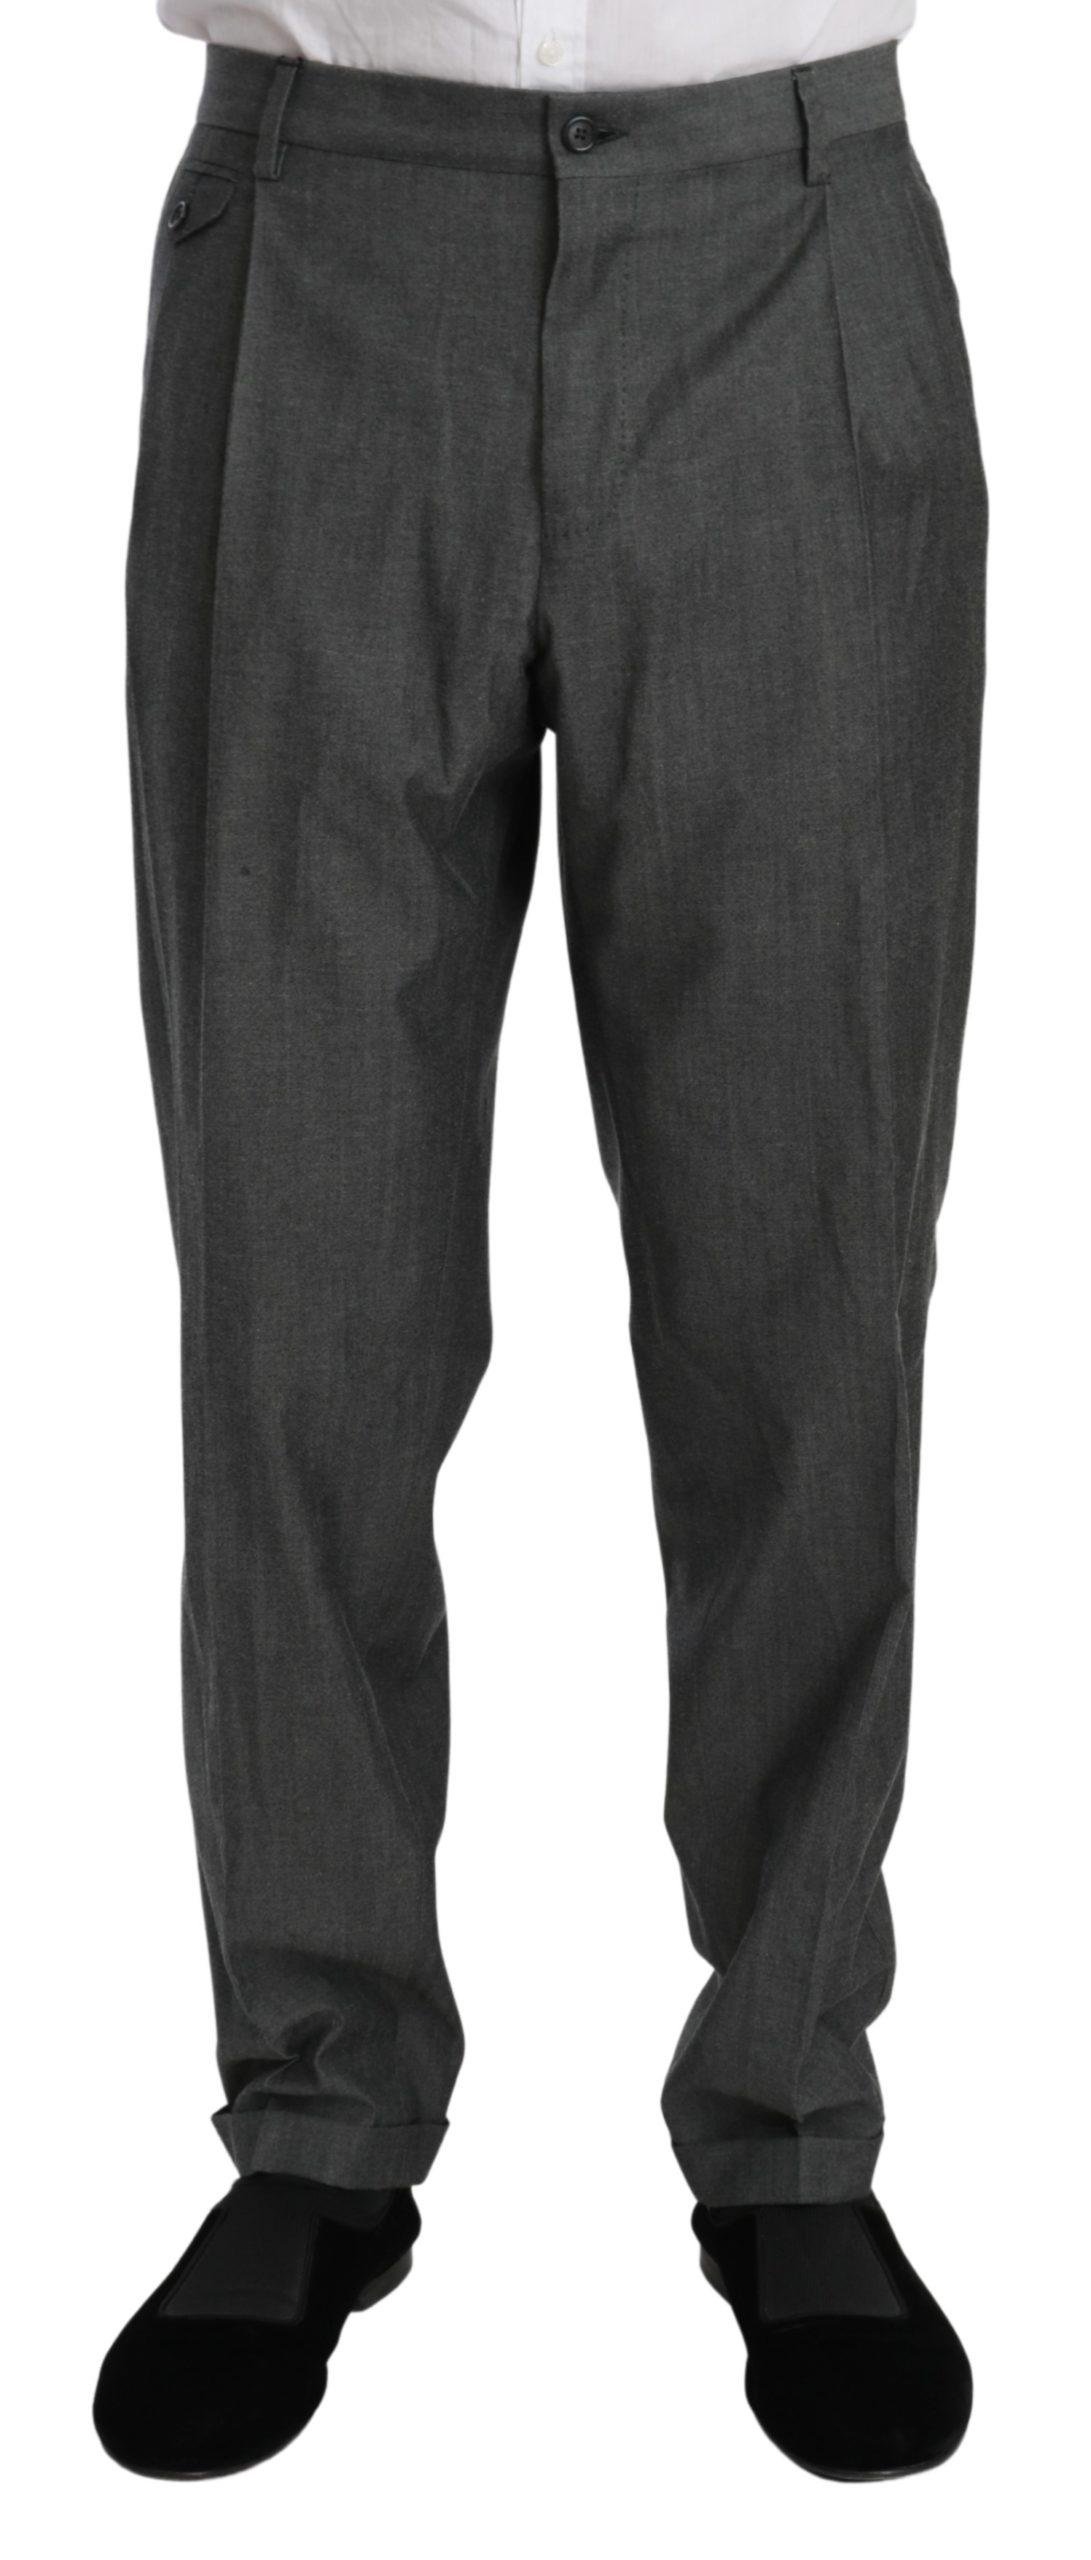 Dolce & Gabbana Men's Formal Dress Virgin Wool Trouser Gray PAN70996 - IT54 | XL